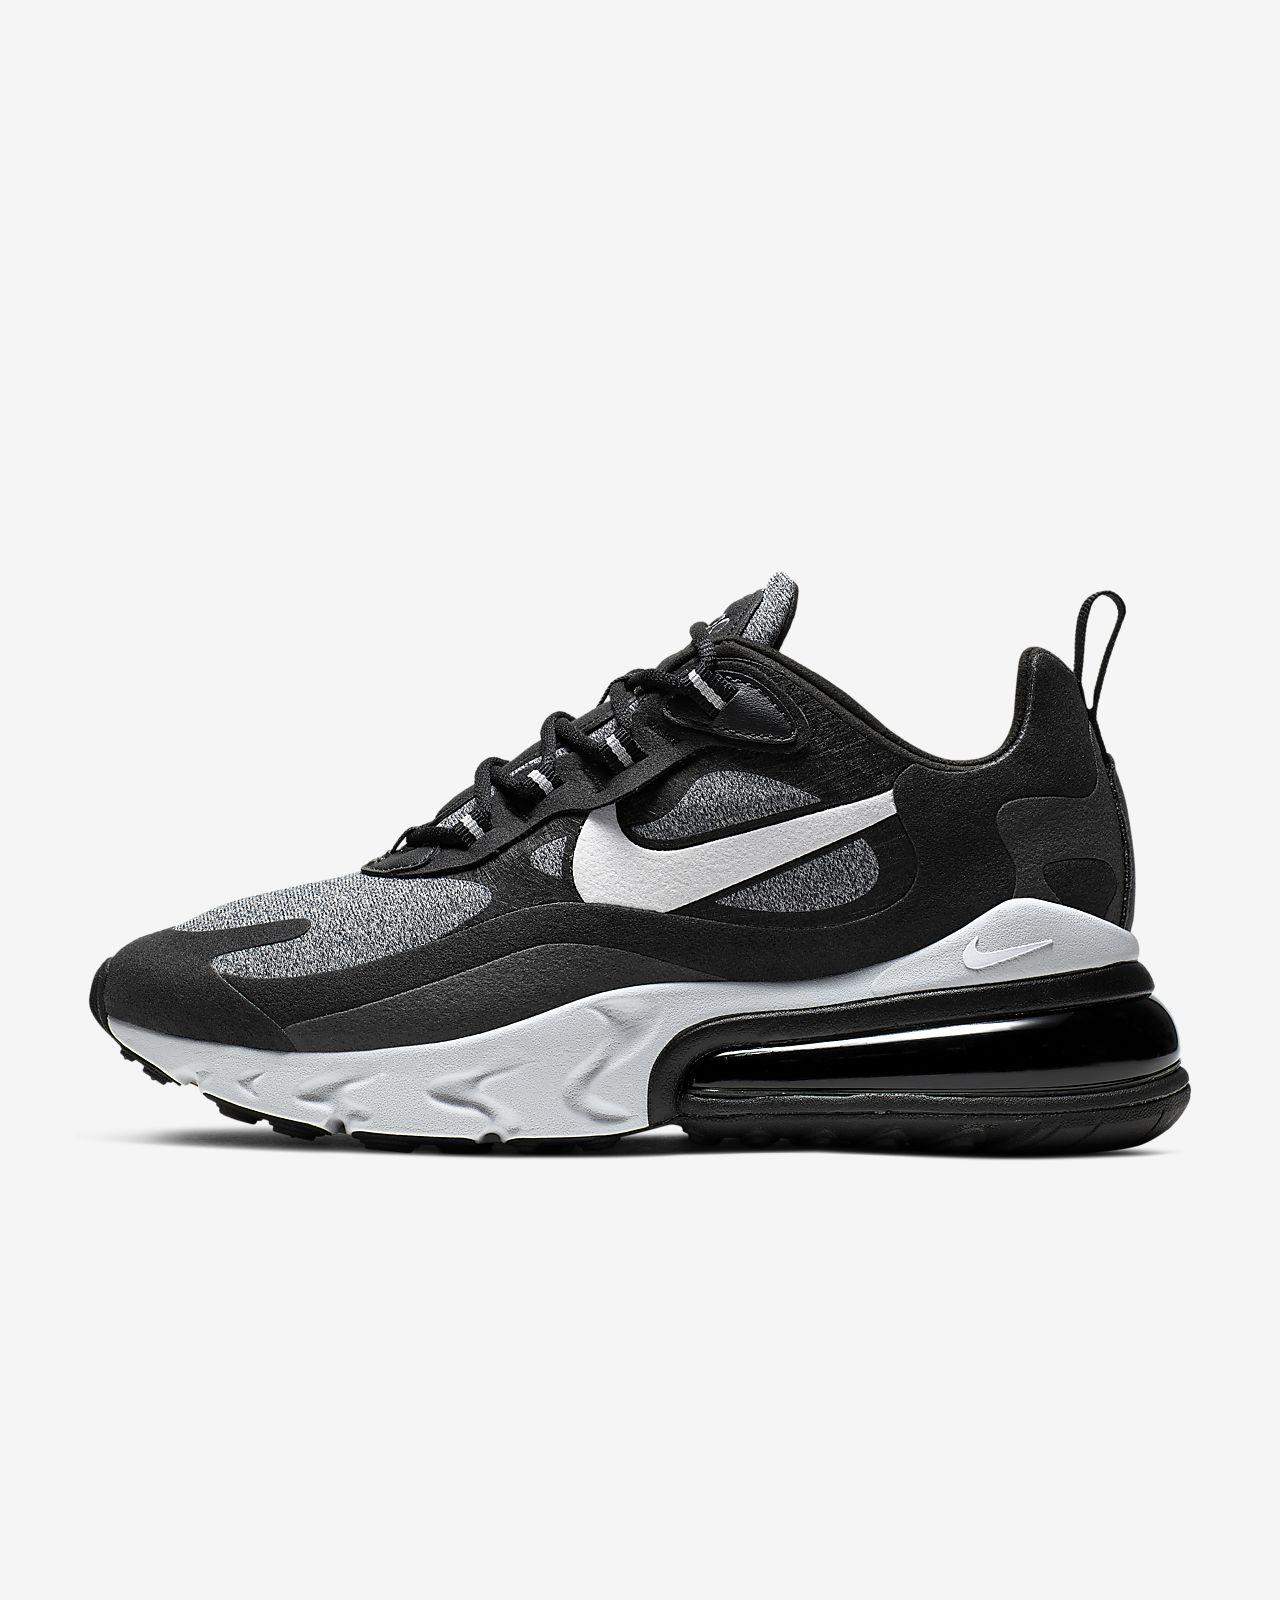 Nike Air Max 270 React in schwarz AT6174 005 | everysize